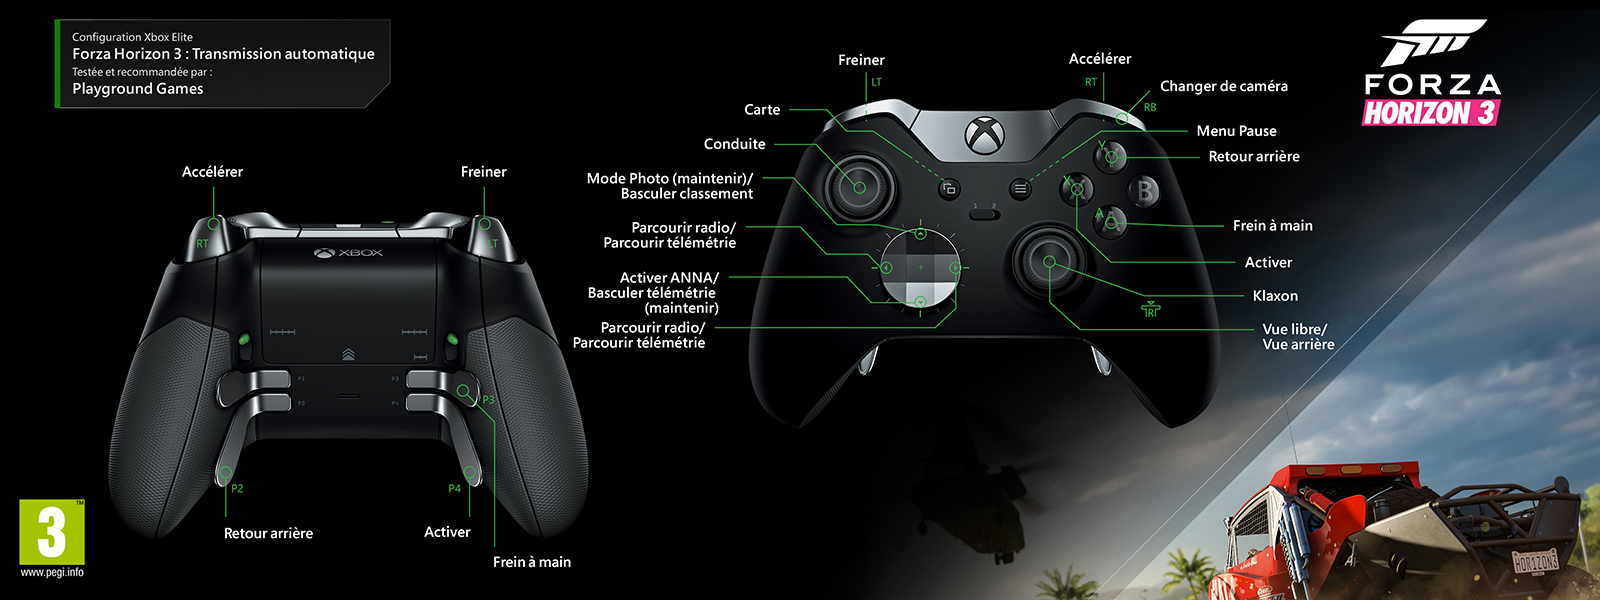 Forza Horizon3, configuration Elite Transmission automatique